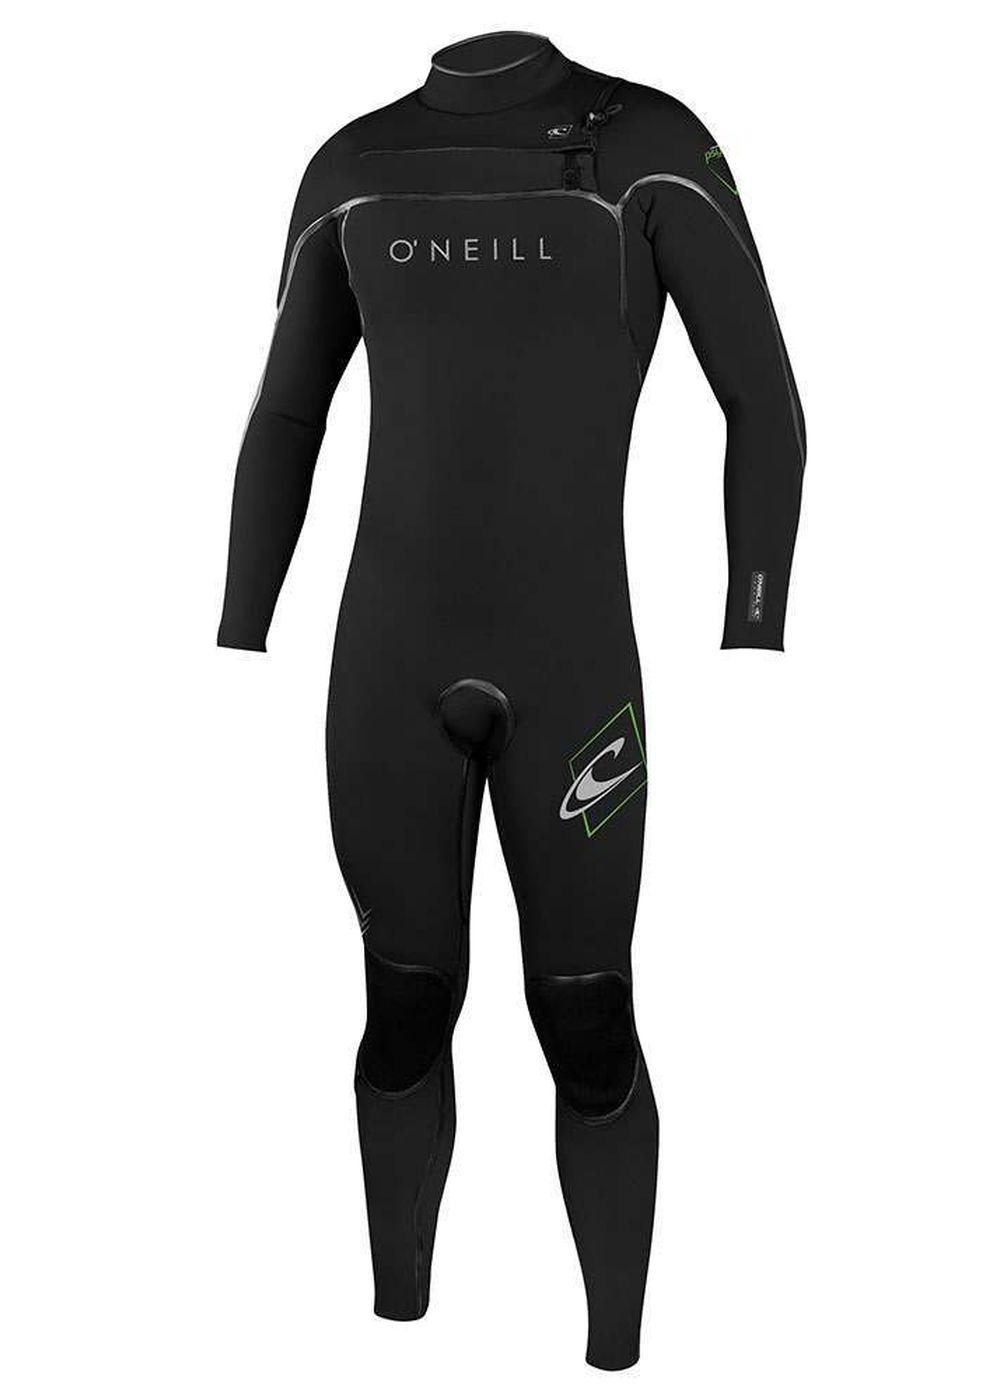 Oneill Psycho One Fz 4/3 Fsw Wetsuit 2017 Black Picture